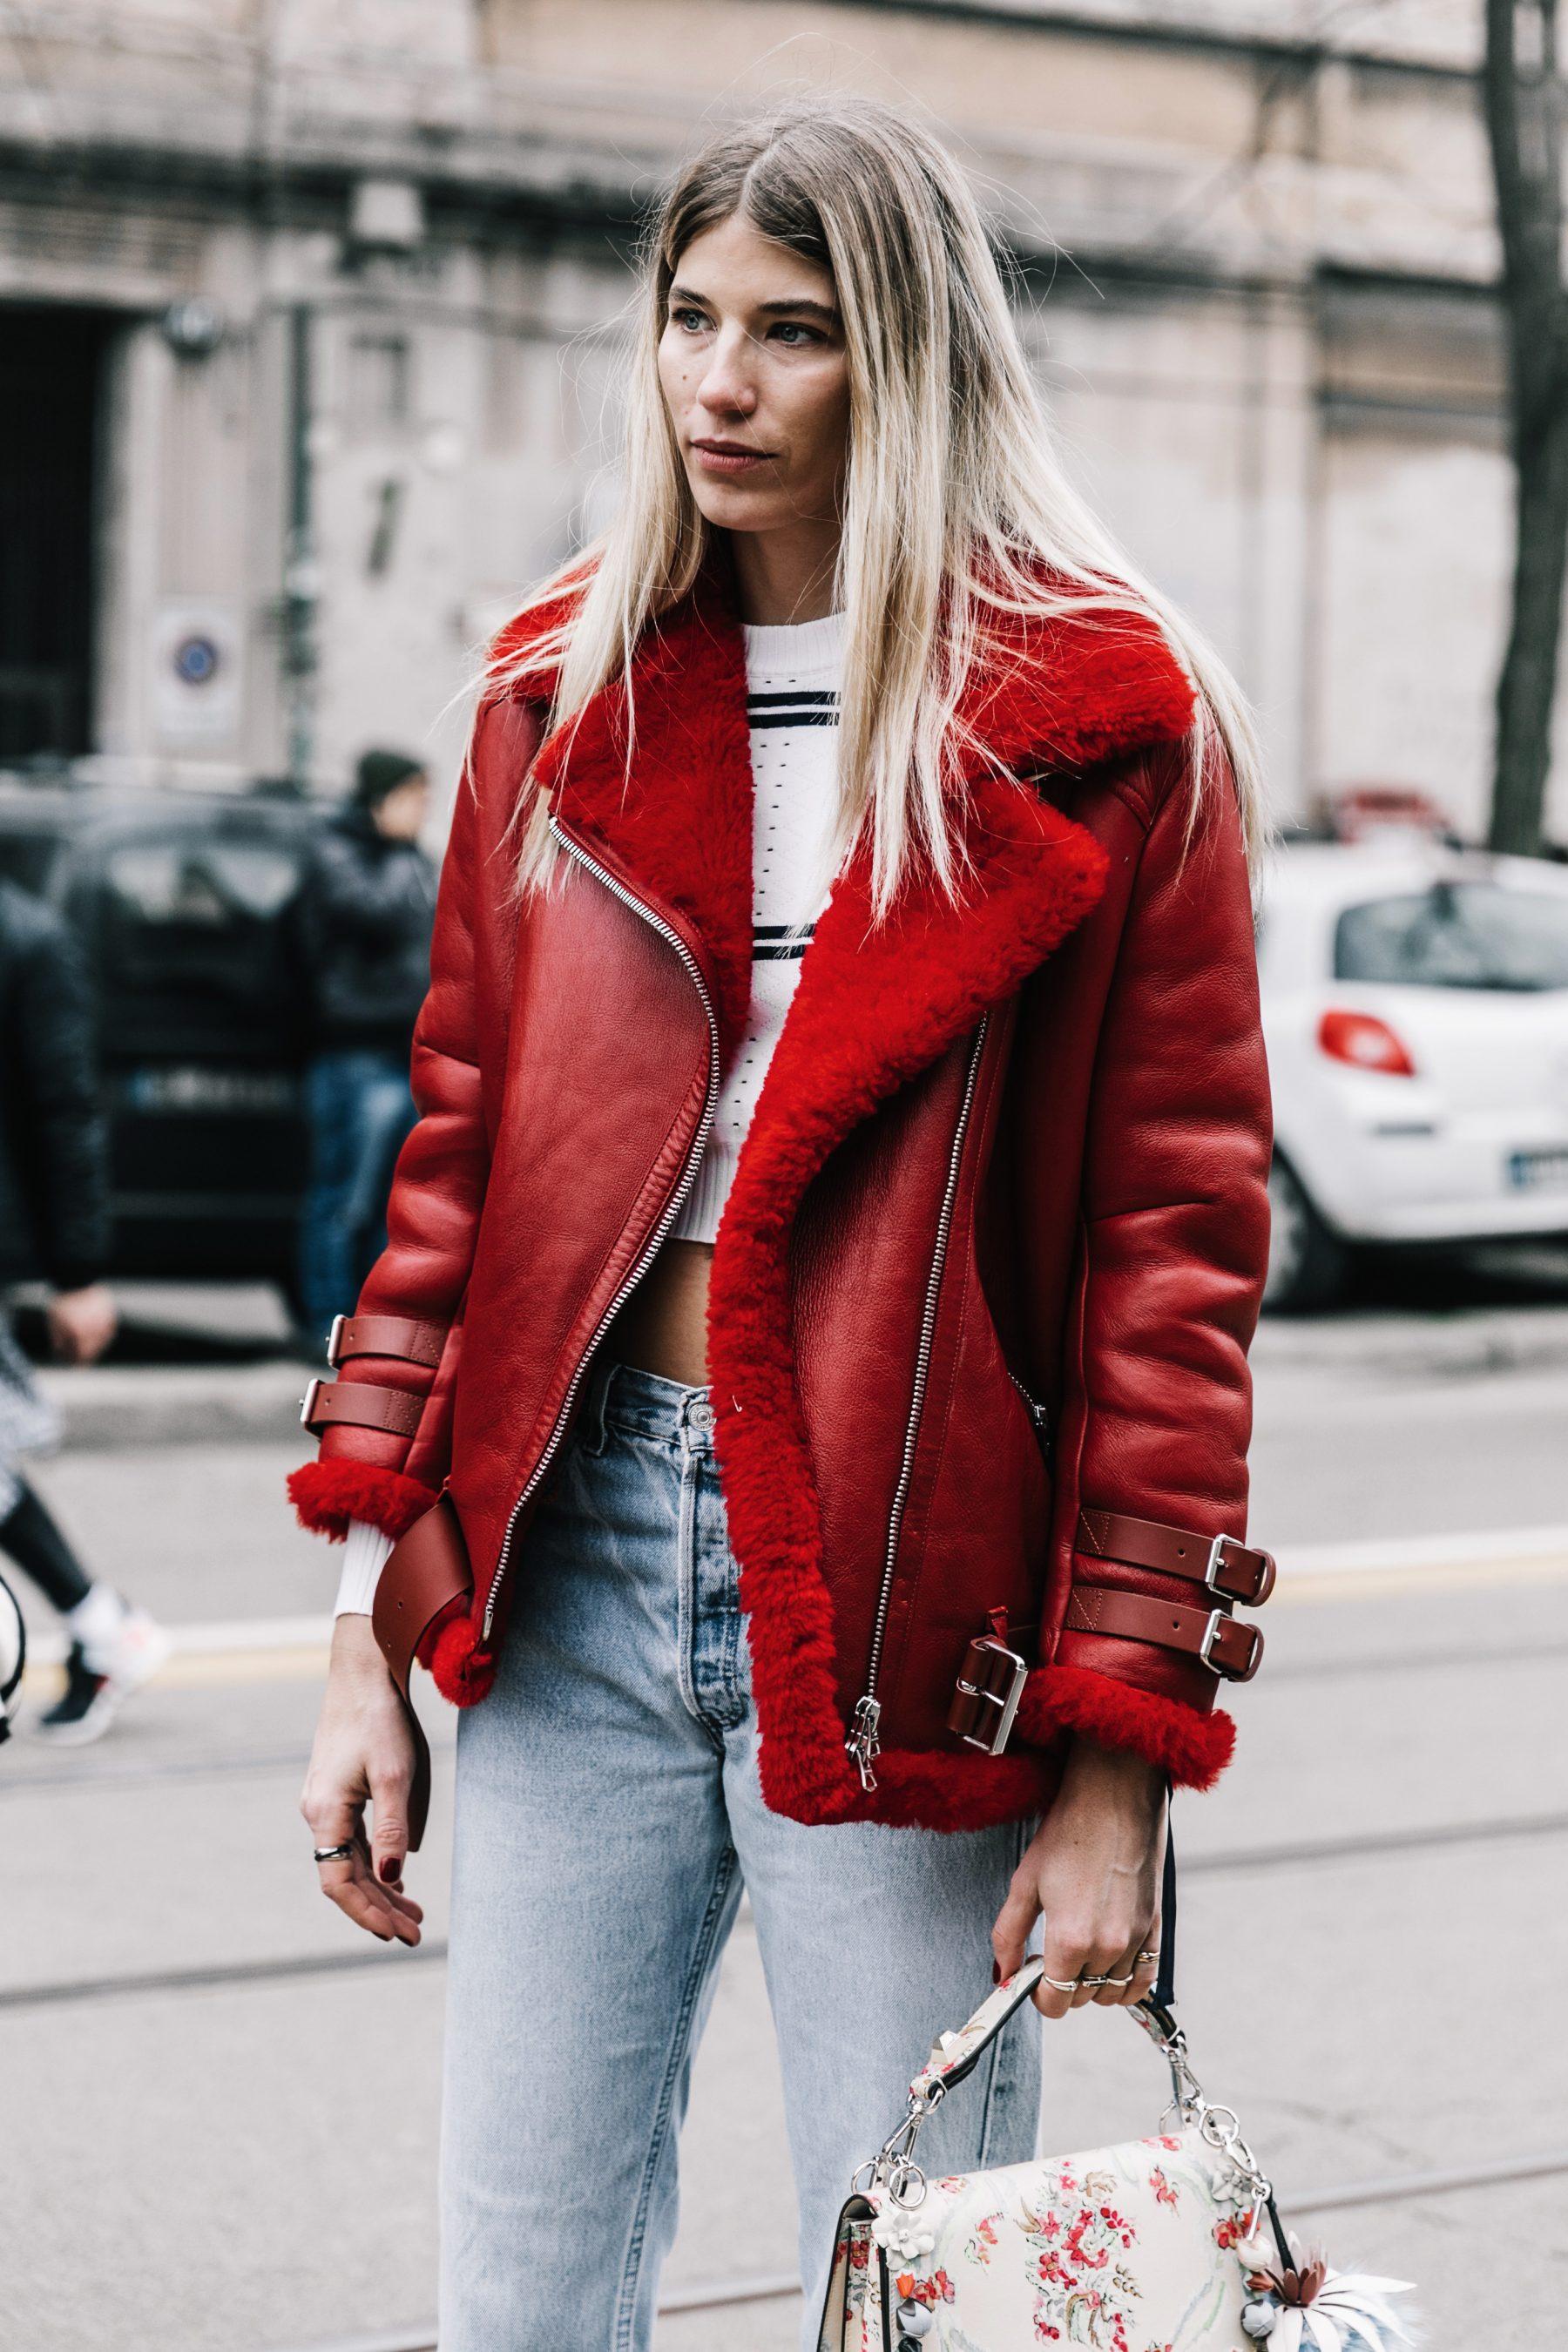 622537-Milan_Fashion_Week_Fall_2017-MFW-Street_Style-Fendi-Max_Mara-Emilio_Pucci-201-1800x2700